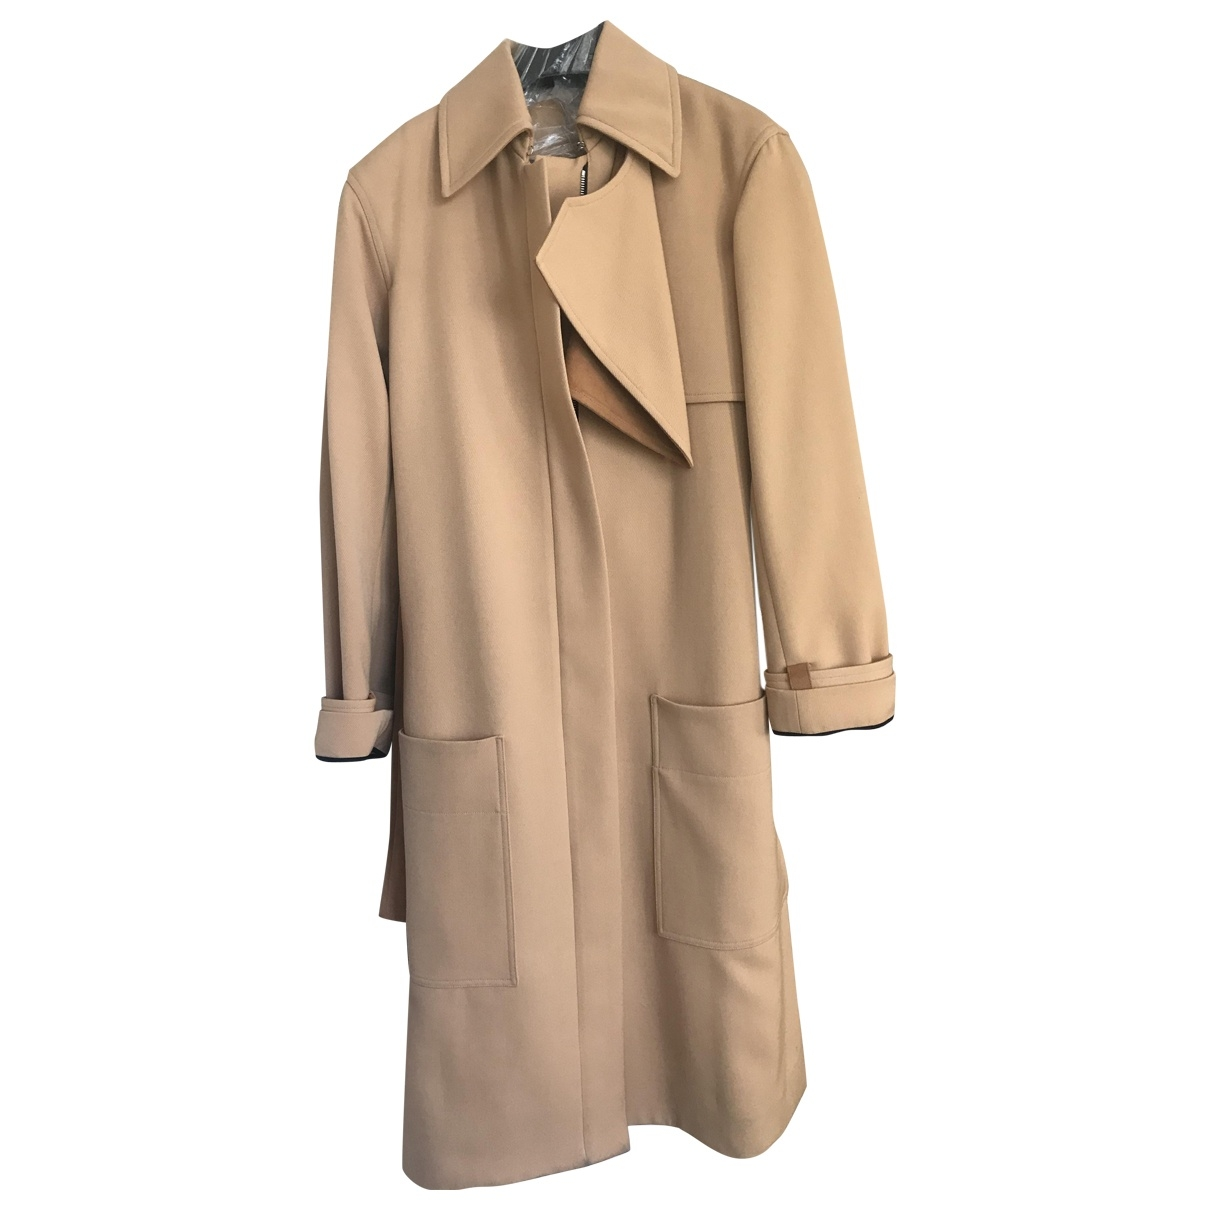 Celine \N Camel Wool Trench coat for Women 36 FR